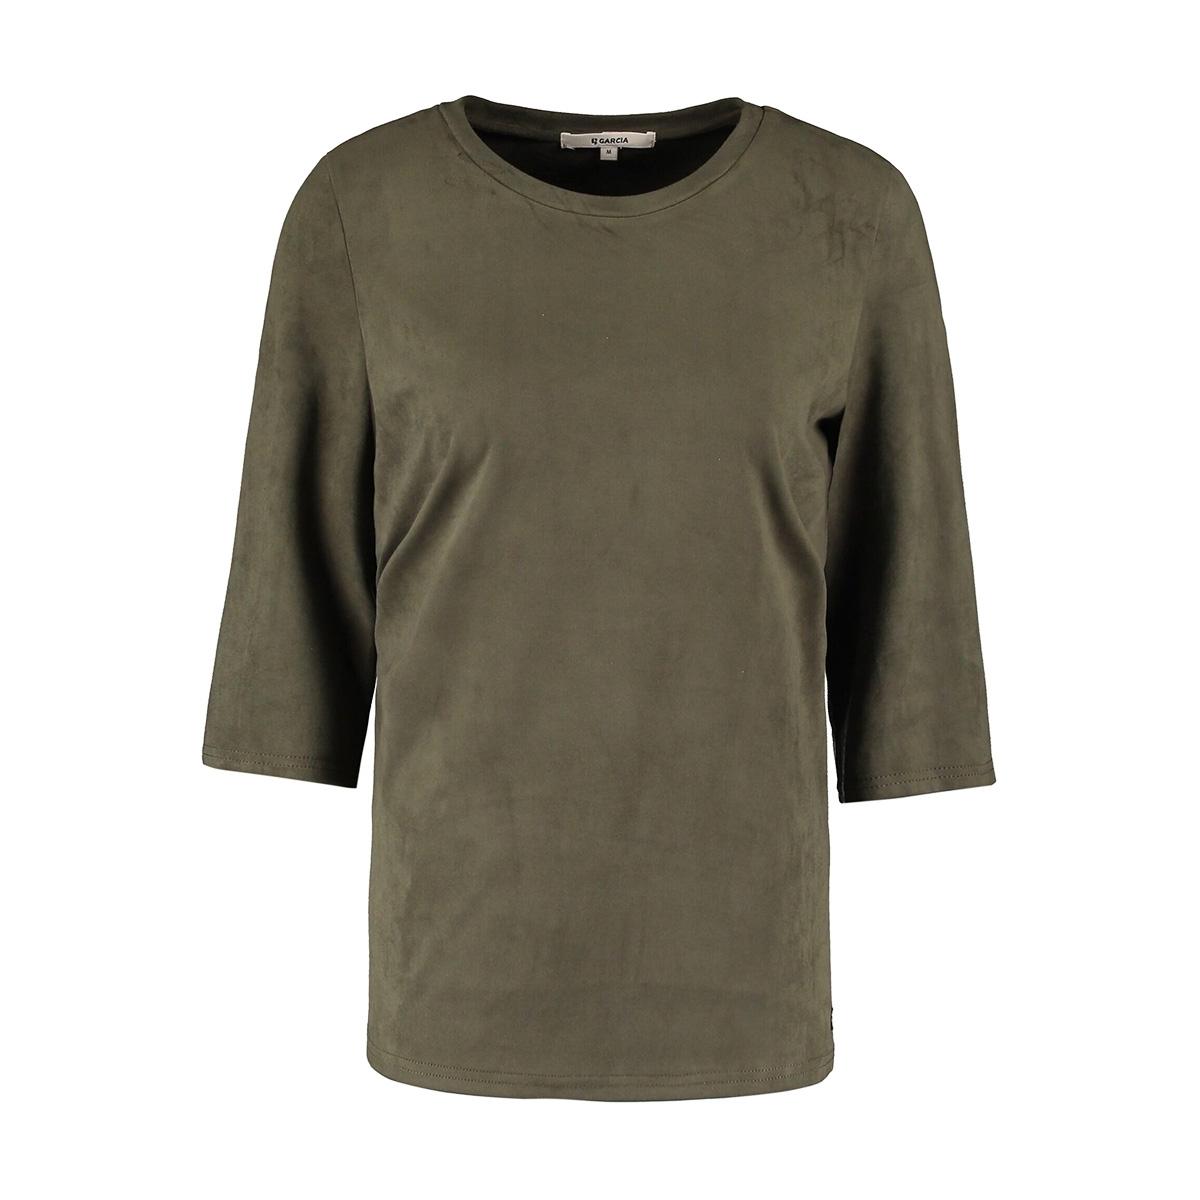 suedine t shirt m00003 garcia t-shirt 3297 olive green